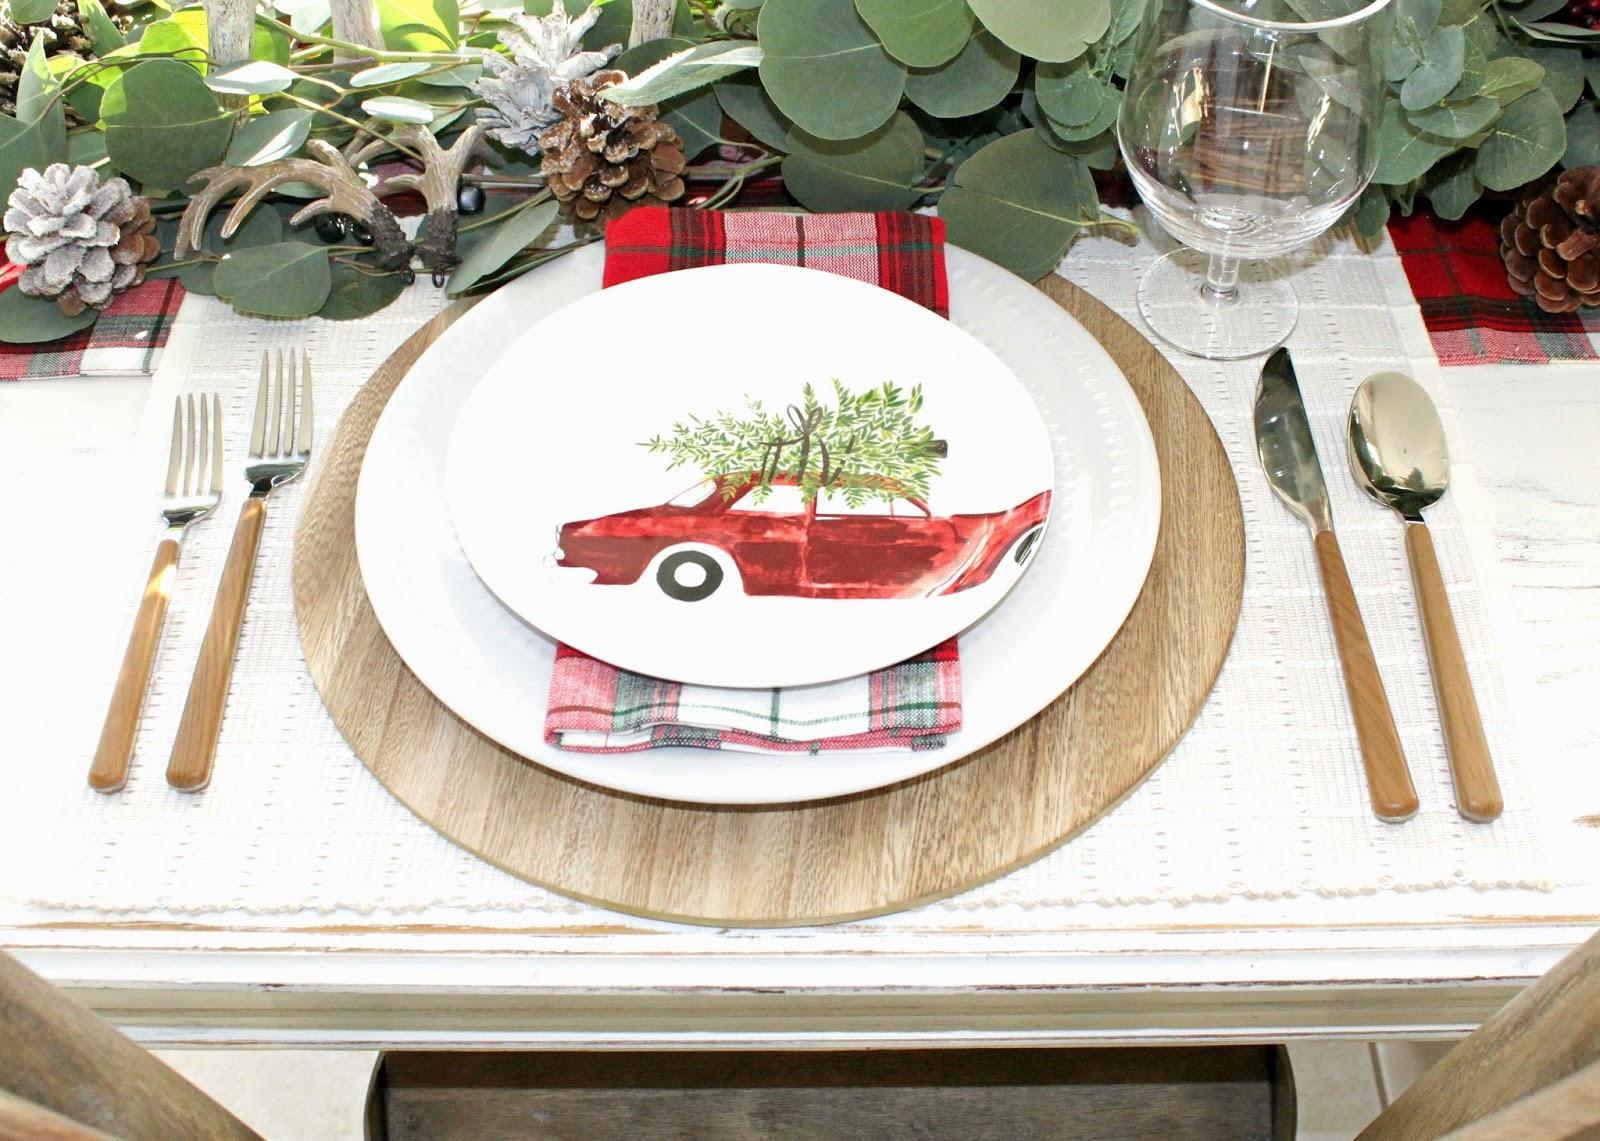 Christmas Plates Uk Hallmark And Napkins Charger Target  sc 1 st  Best Plate 2018 & Christmas Plates Target - Best Plate 2018